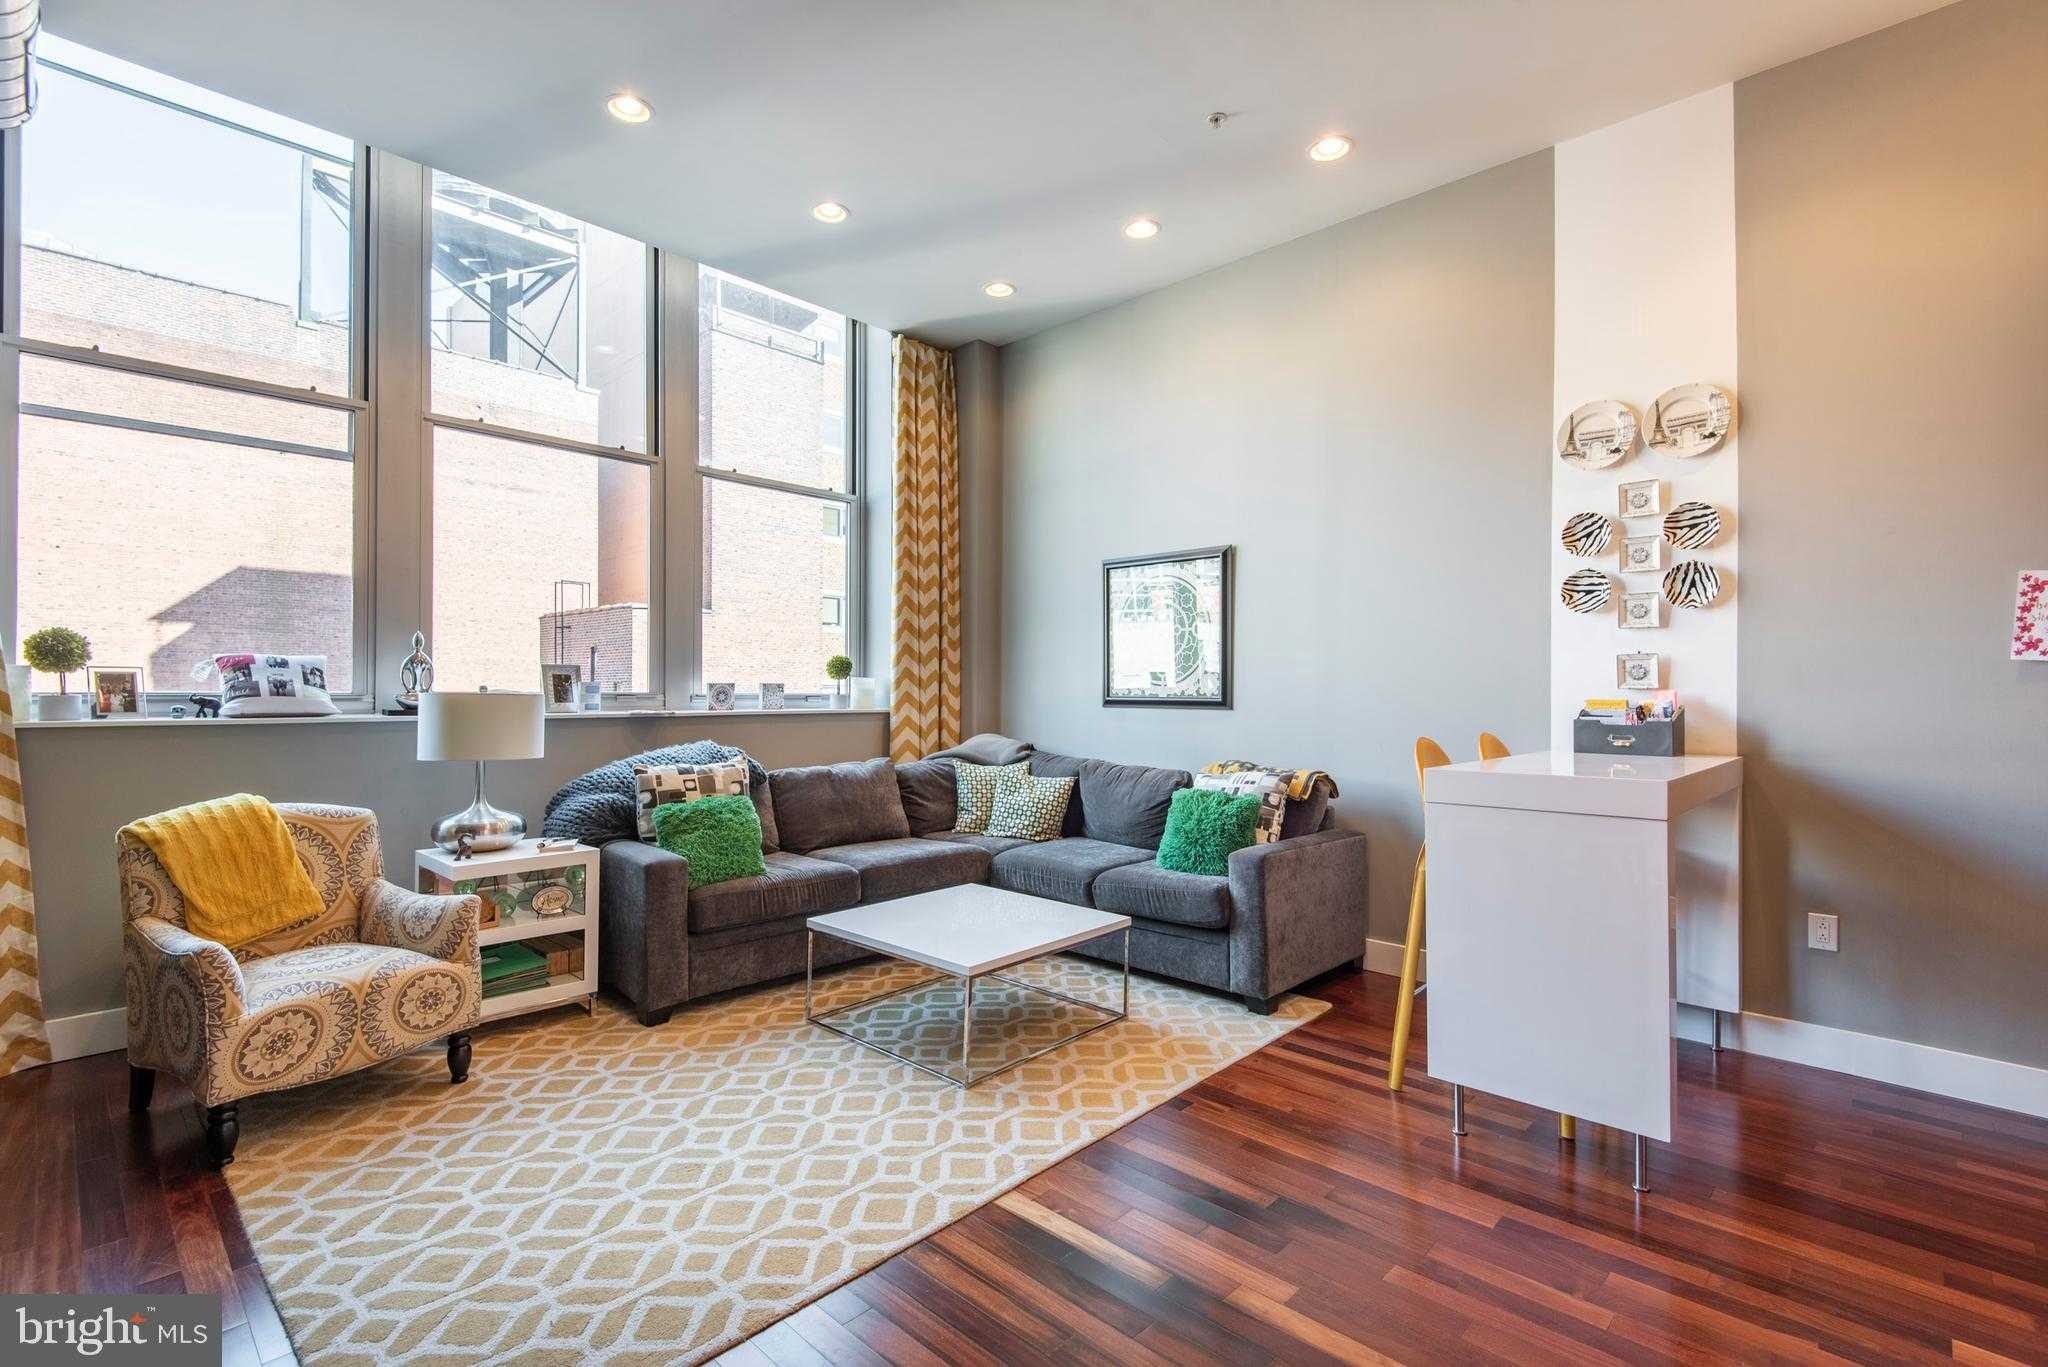 $439,000 - 1Br/1Ba -  for Sale in Washington Sq West, Philadelphia